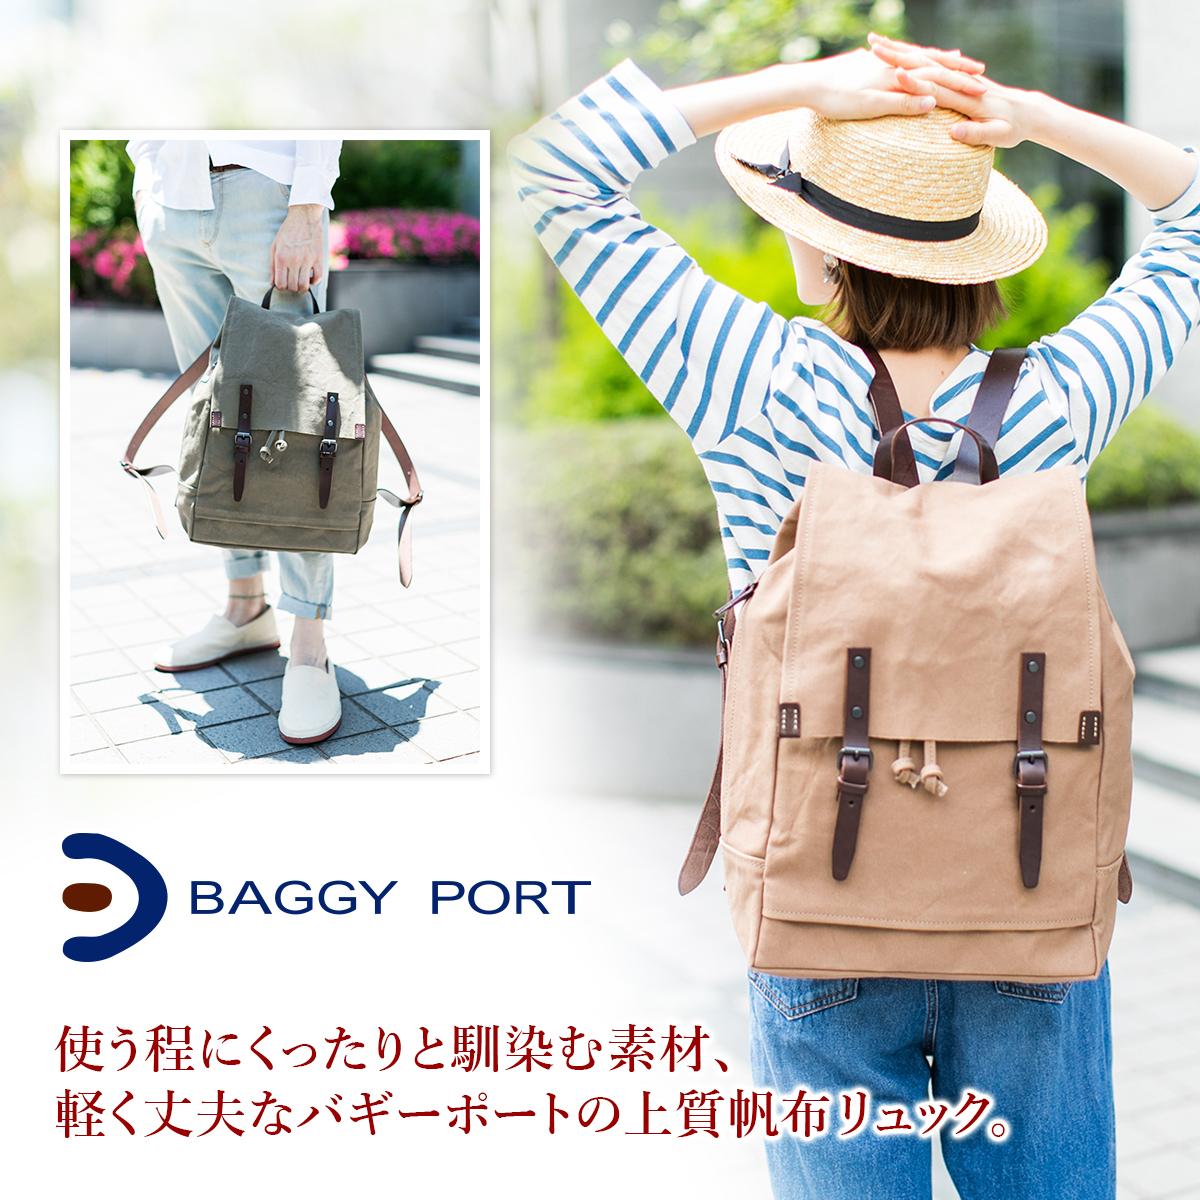 BAGGY PORT COTTON BACKPACK KBS-387